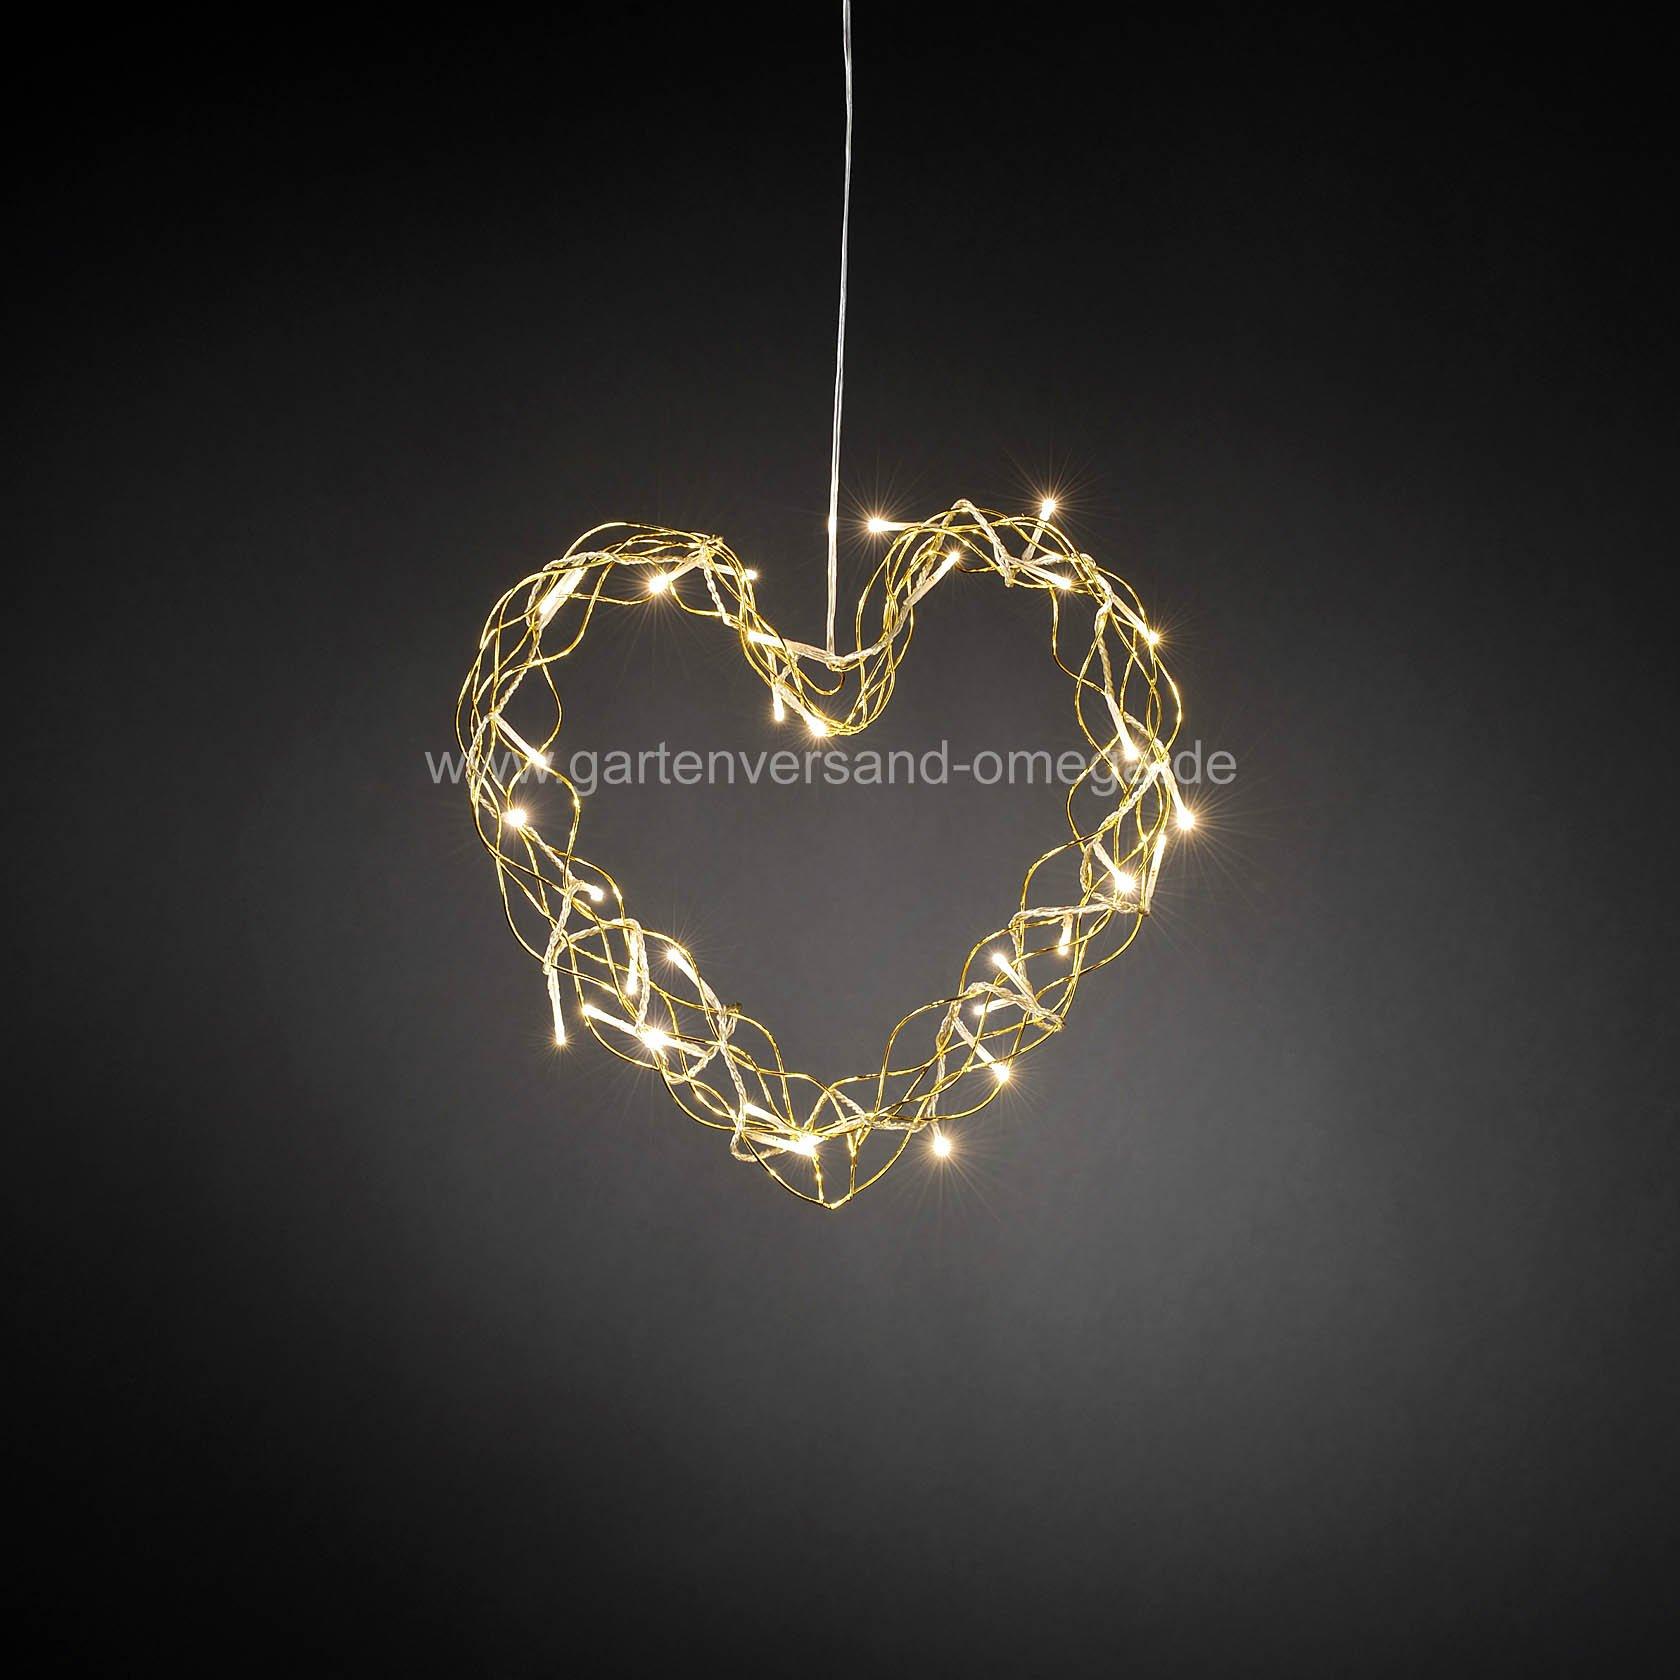 led metallsilhouette herz gold dekorationsbeleuchtung energiesparende weihnachtsbeleuchtung. Black Bedroom Furniture Sets. Home Design Ideas